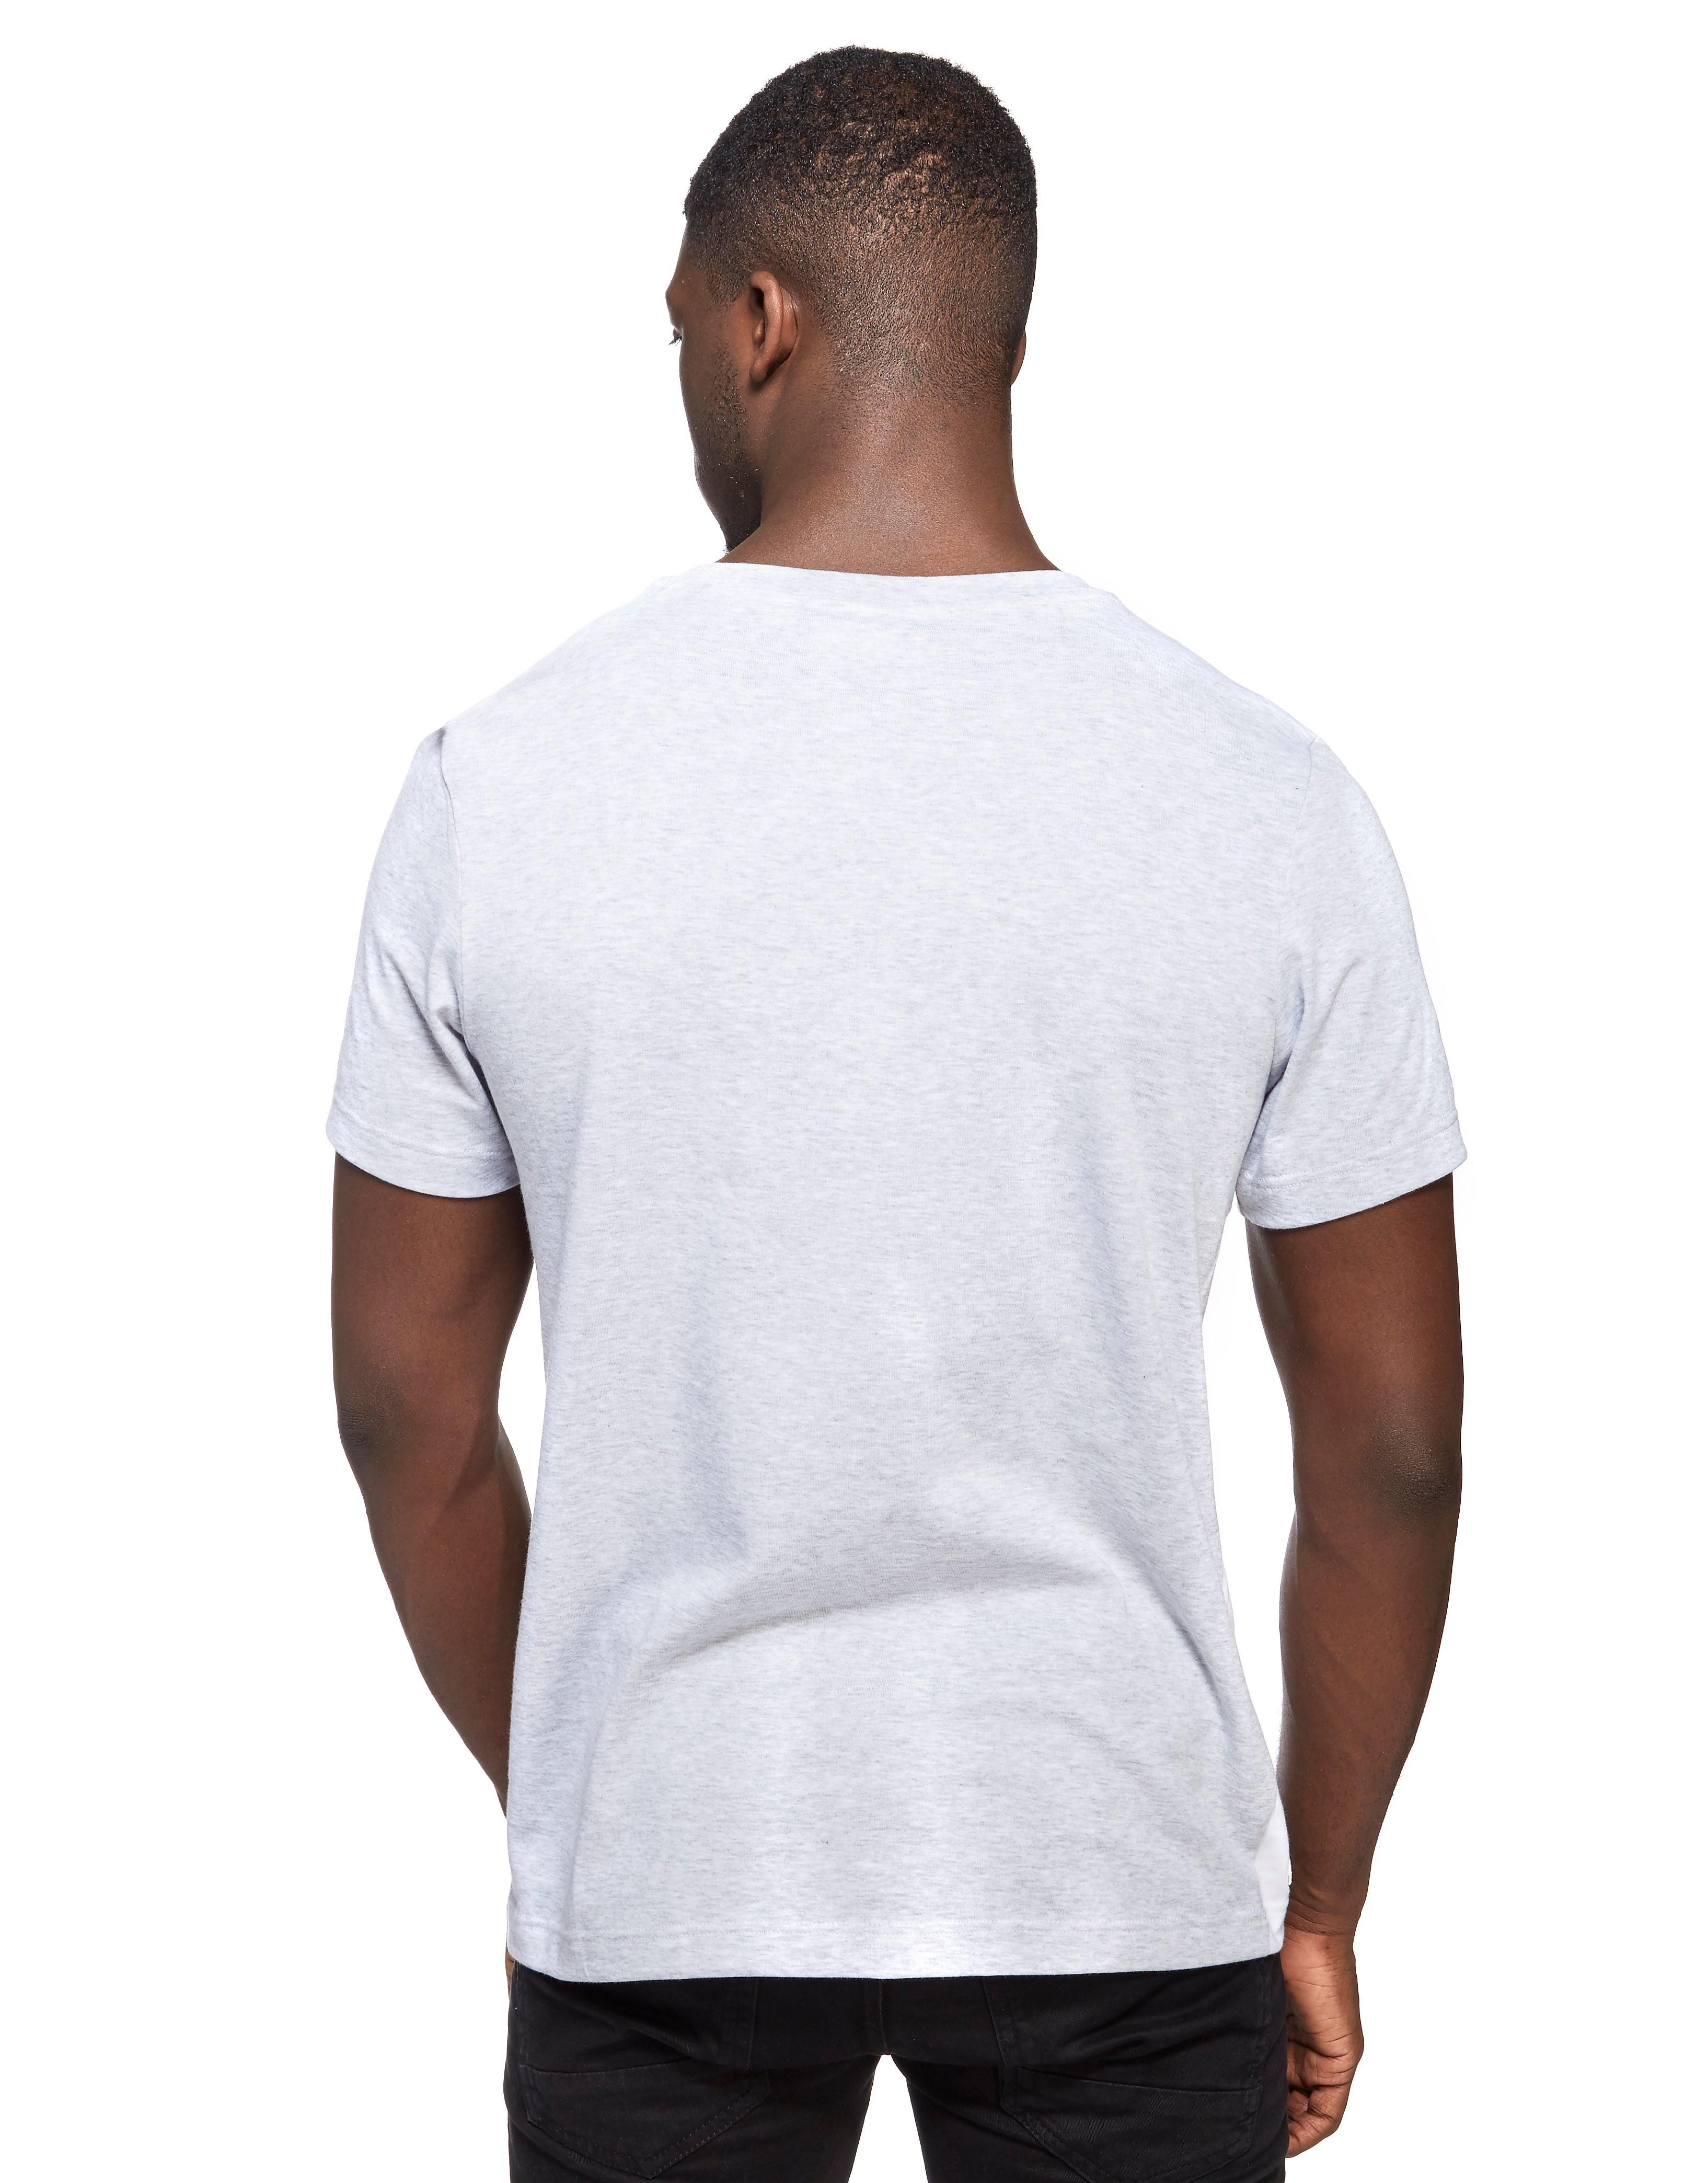 Lacoste Diagonal Cut T-Shirt